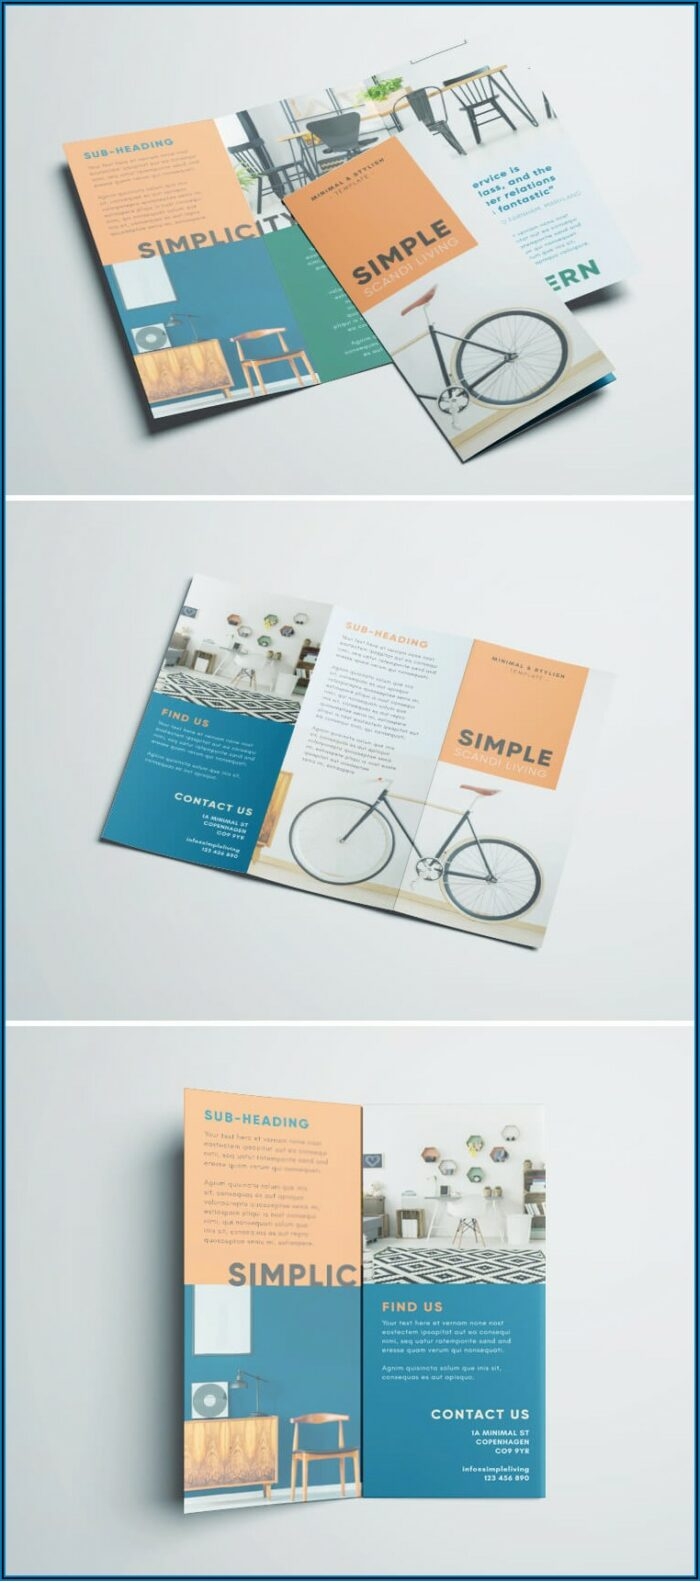 3 Fold Brochure Indesign Template